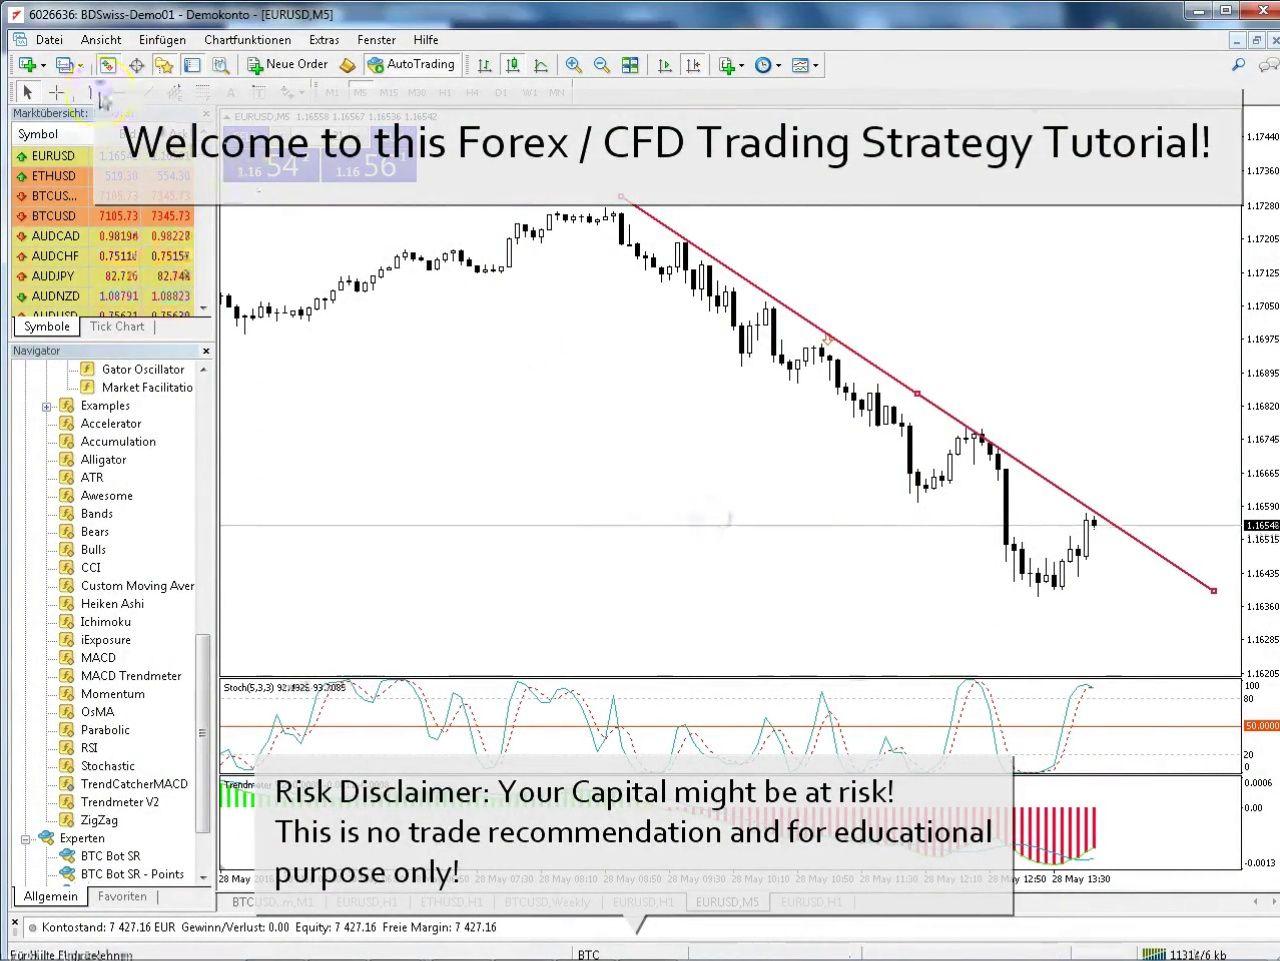 cfd trading tipps bitcoin trading platform 2021